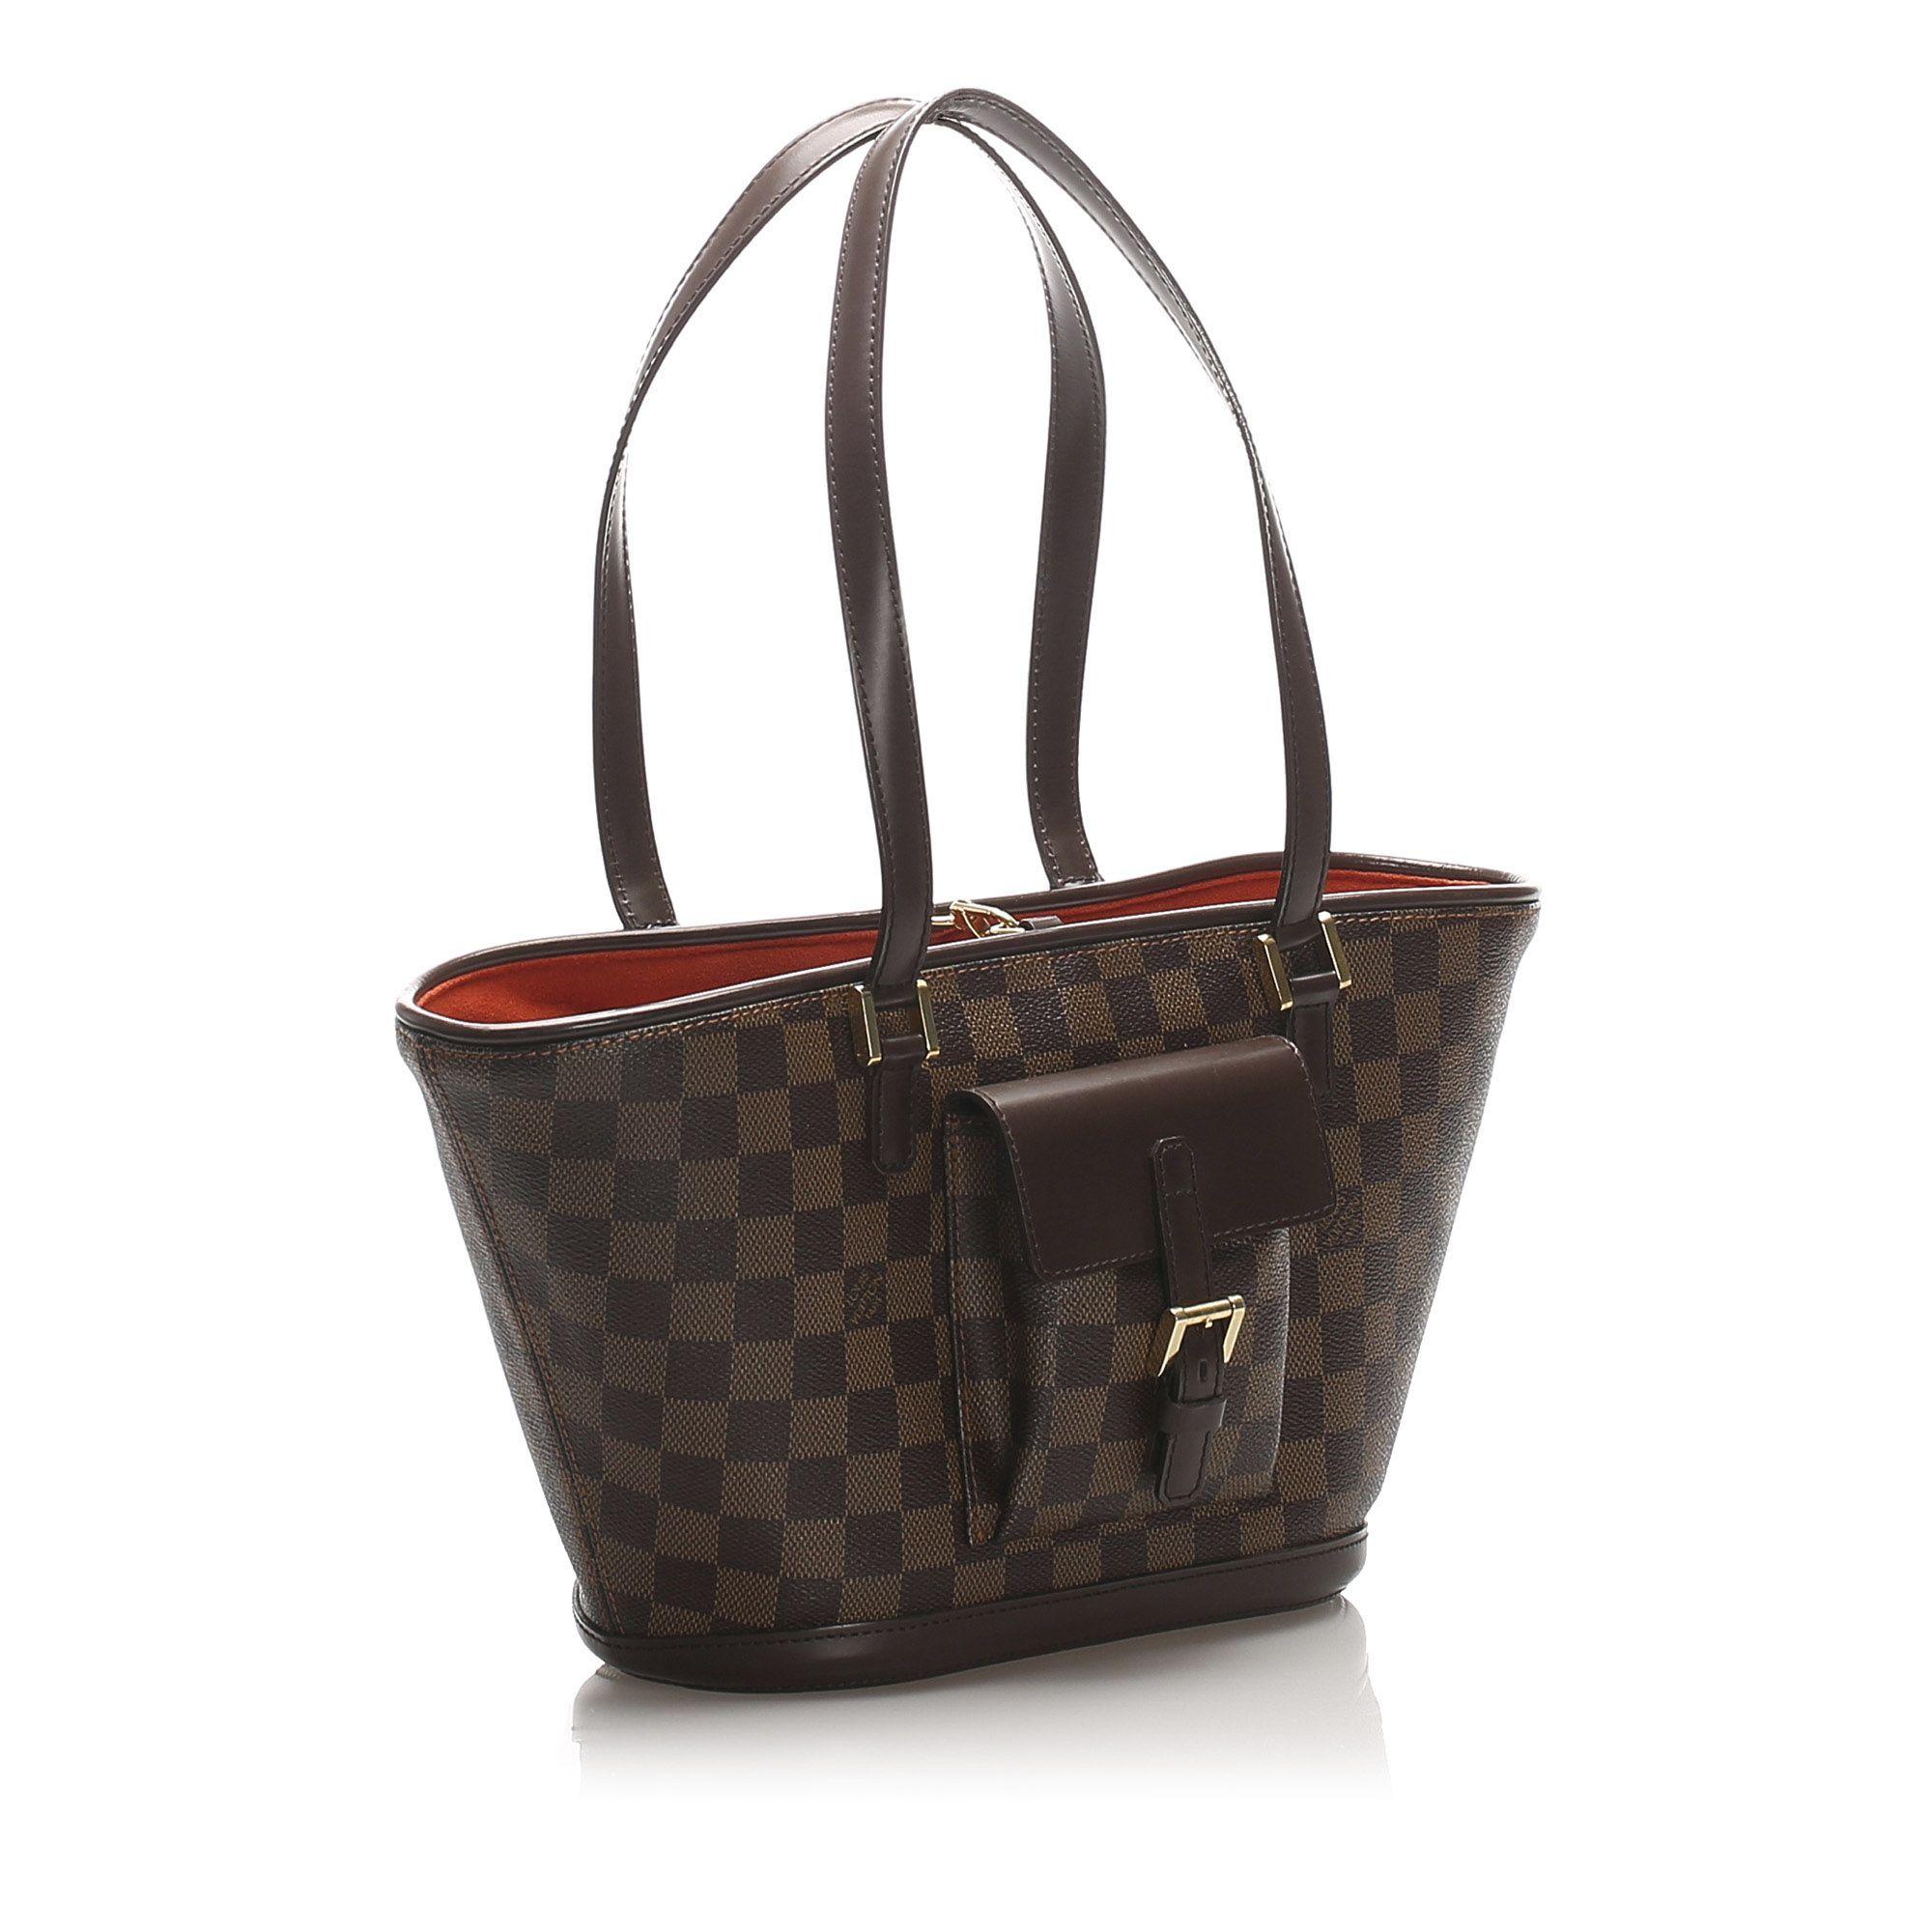 Vintage Louis Vuitton Damier Ebene Manosque PM Brown